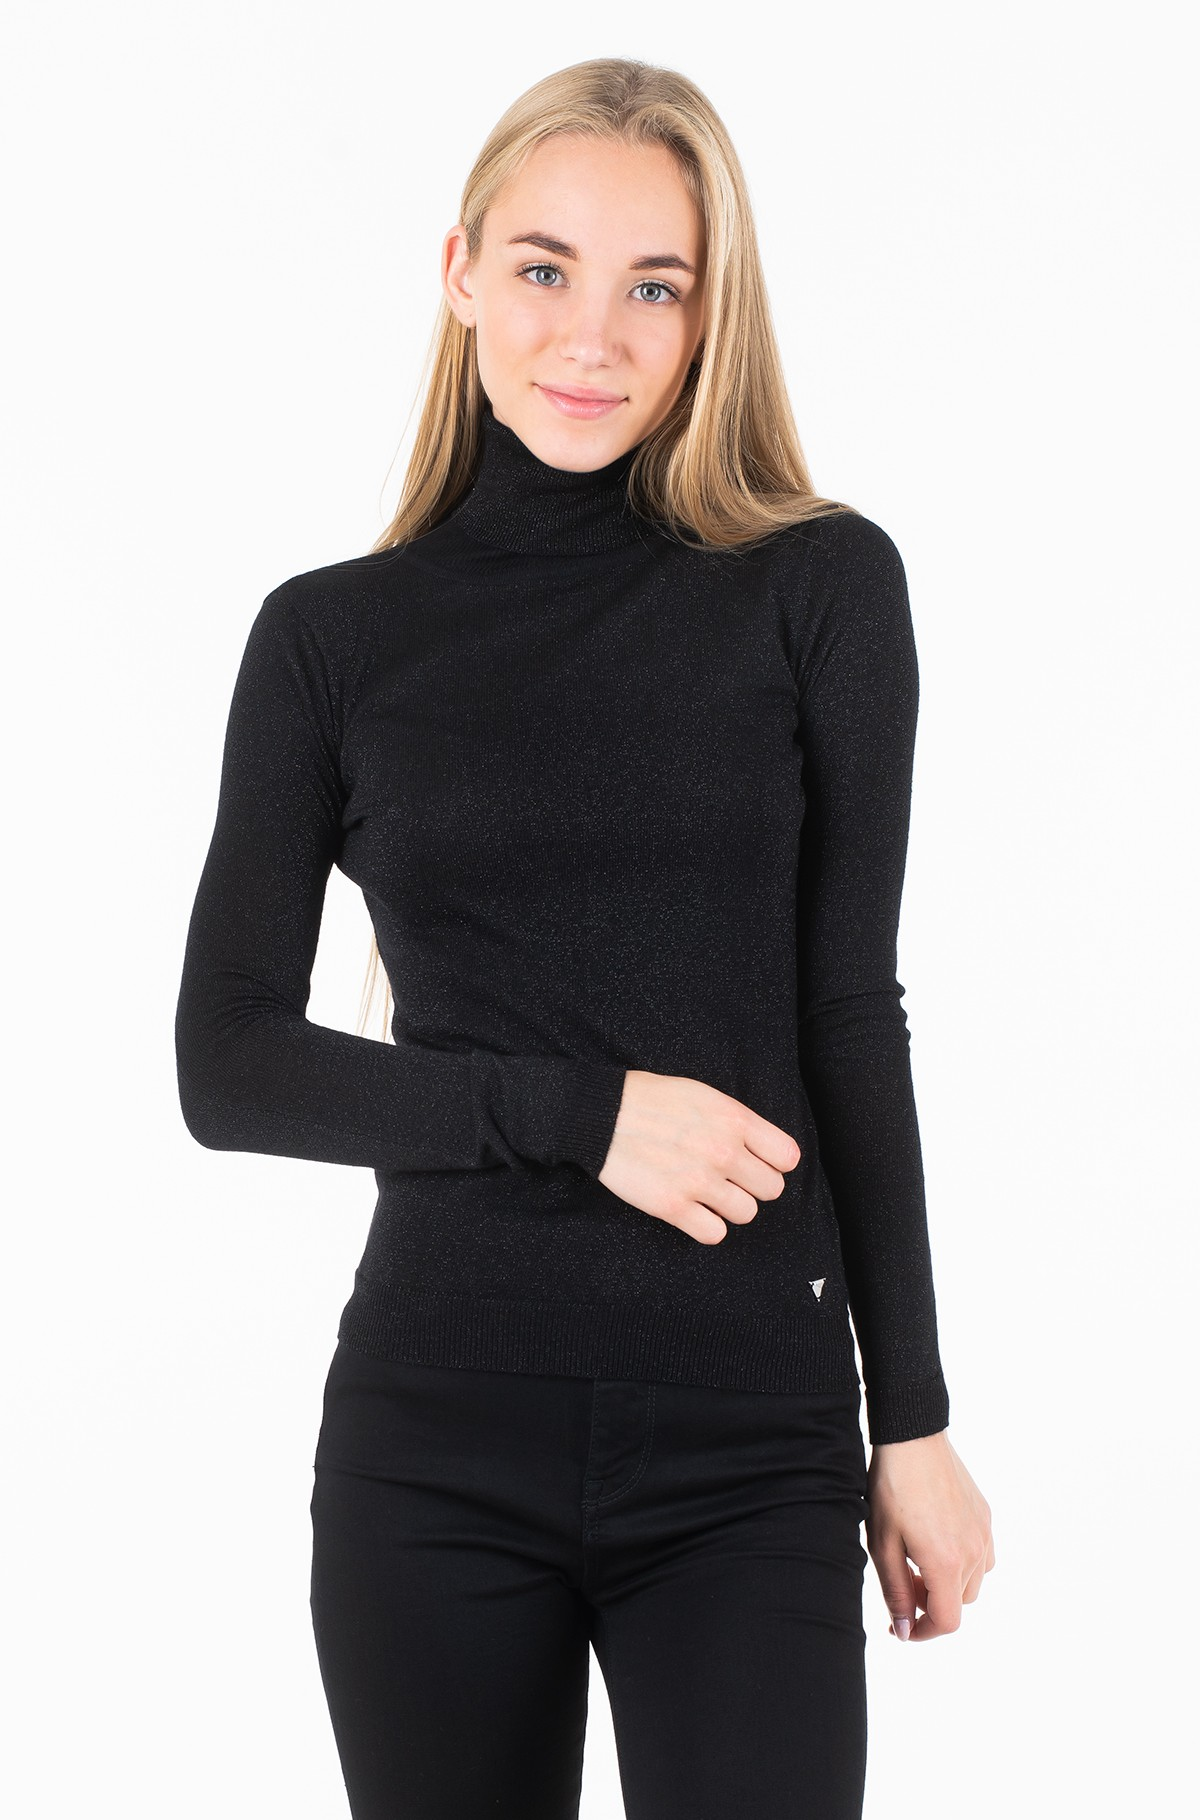 Sweater W94R81 Z2IF0-full-1